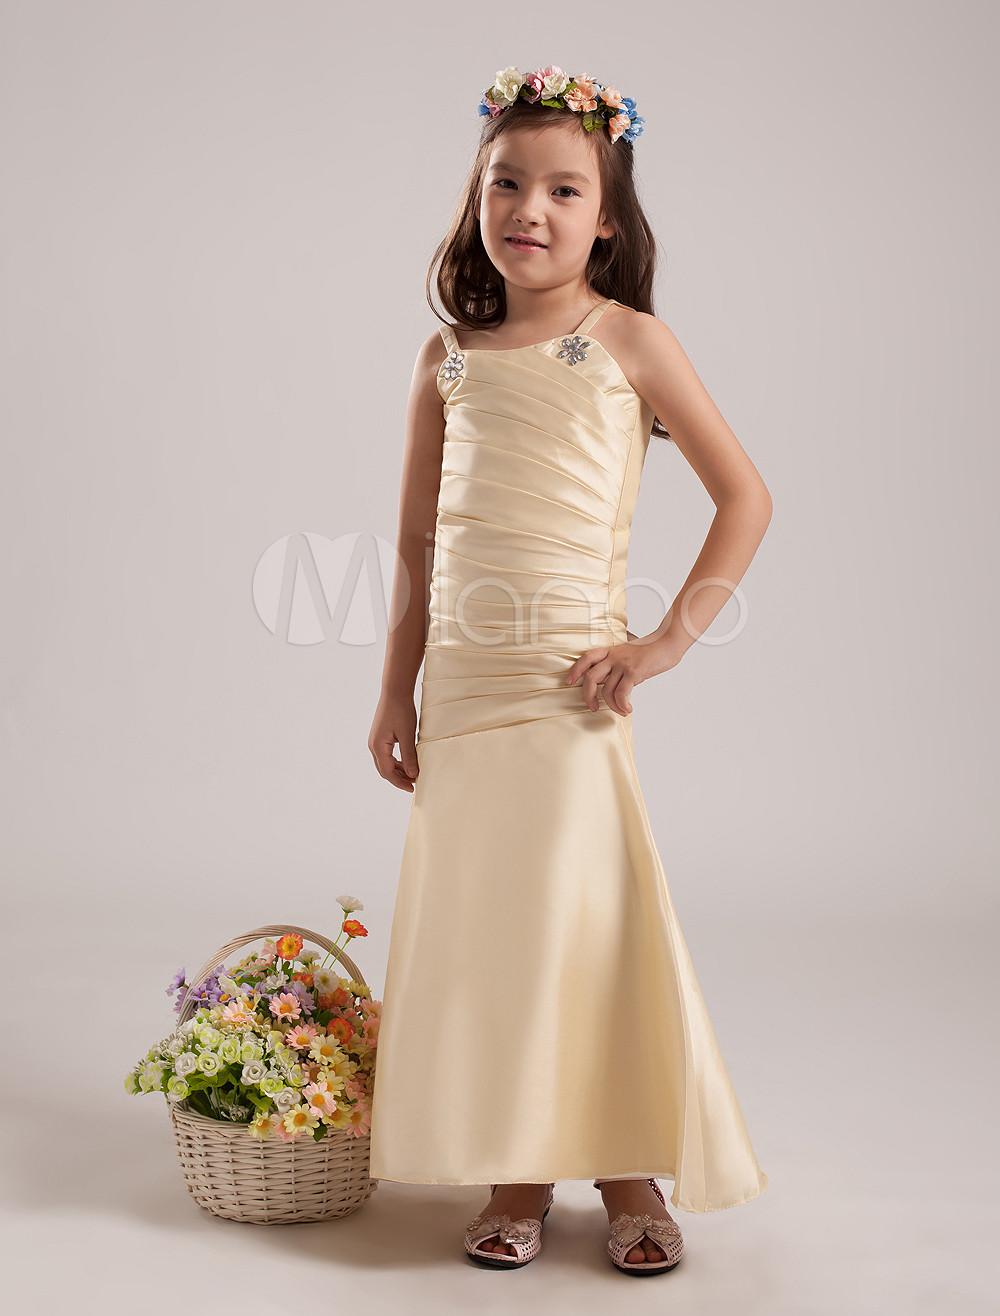 Luxurious Champagne Taffeta Thin Shoulder Straps Floor Length Junior Bridesmaid Dress